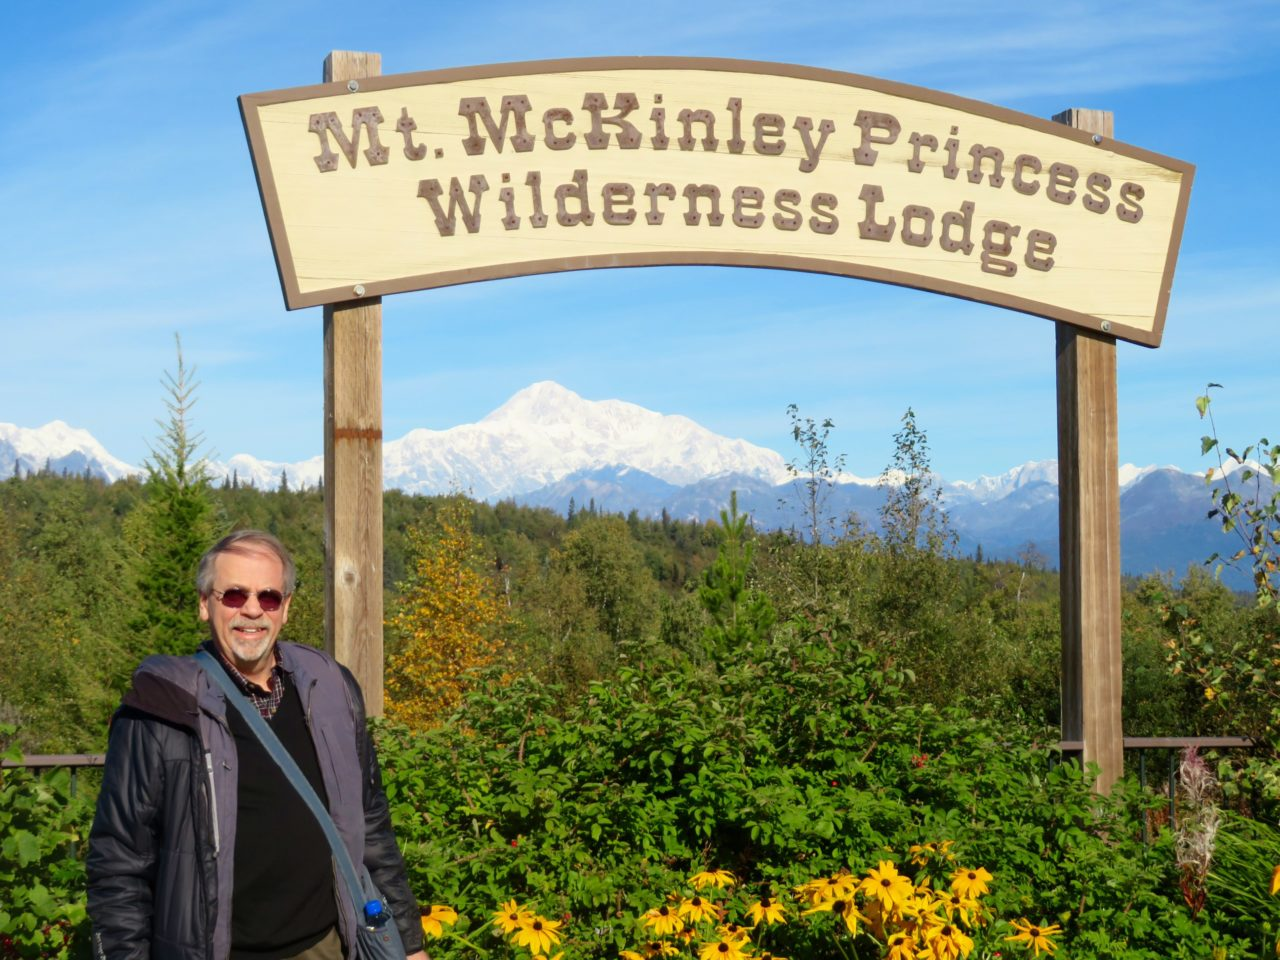 Mt. McKinley Princess Wilderness Lodge ~ Alaska Cruise Tour